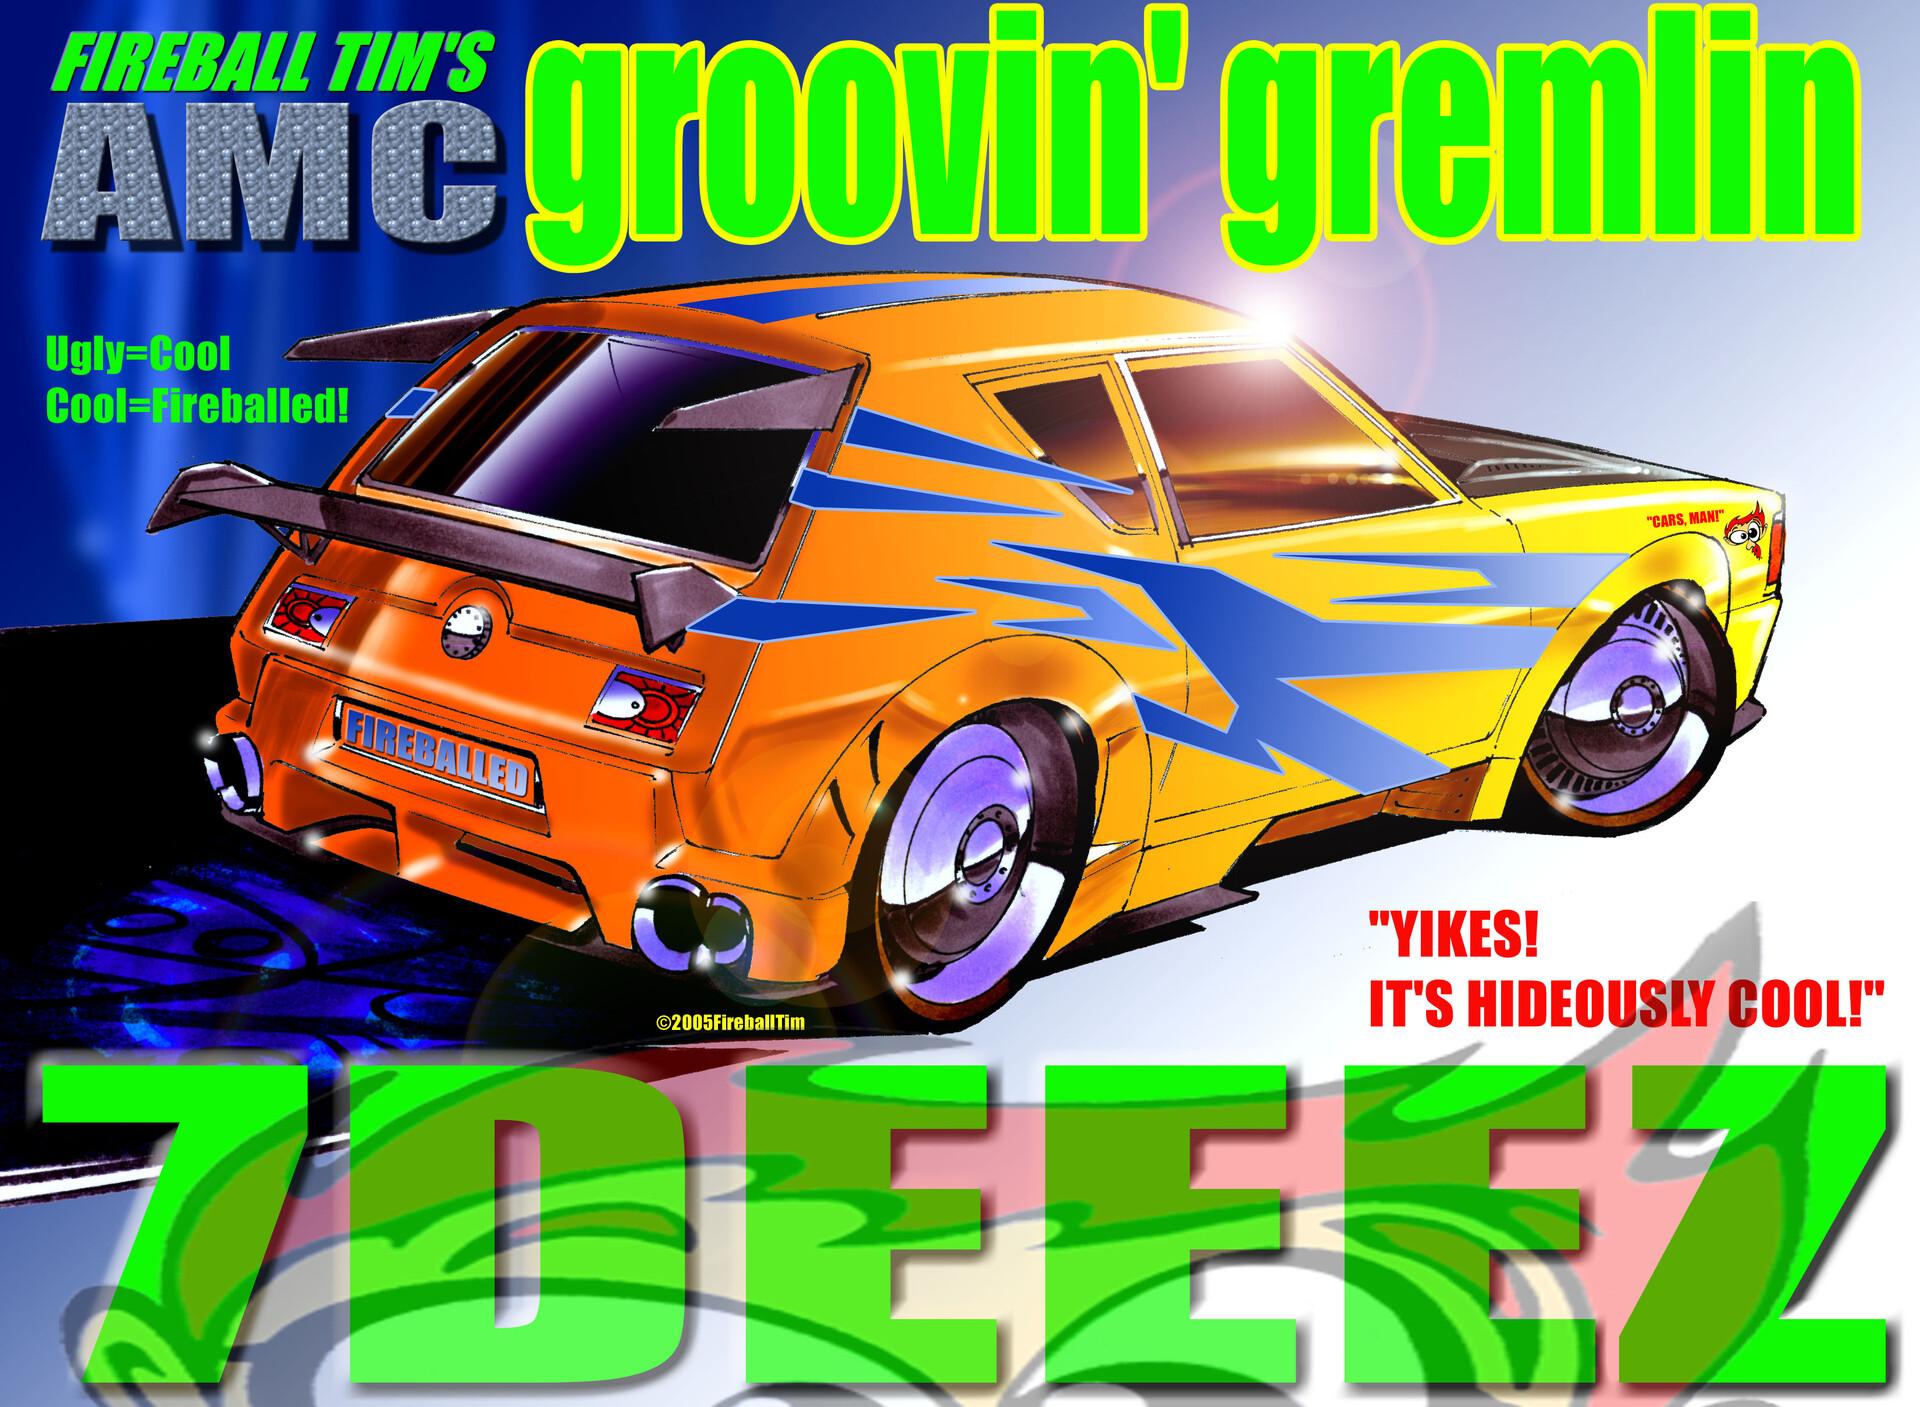 Groovin' Gremlin - Client -FUNRISE